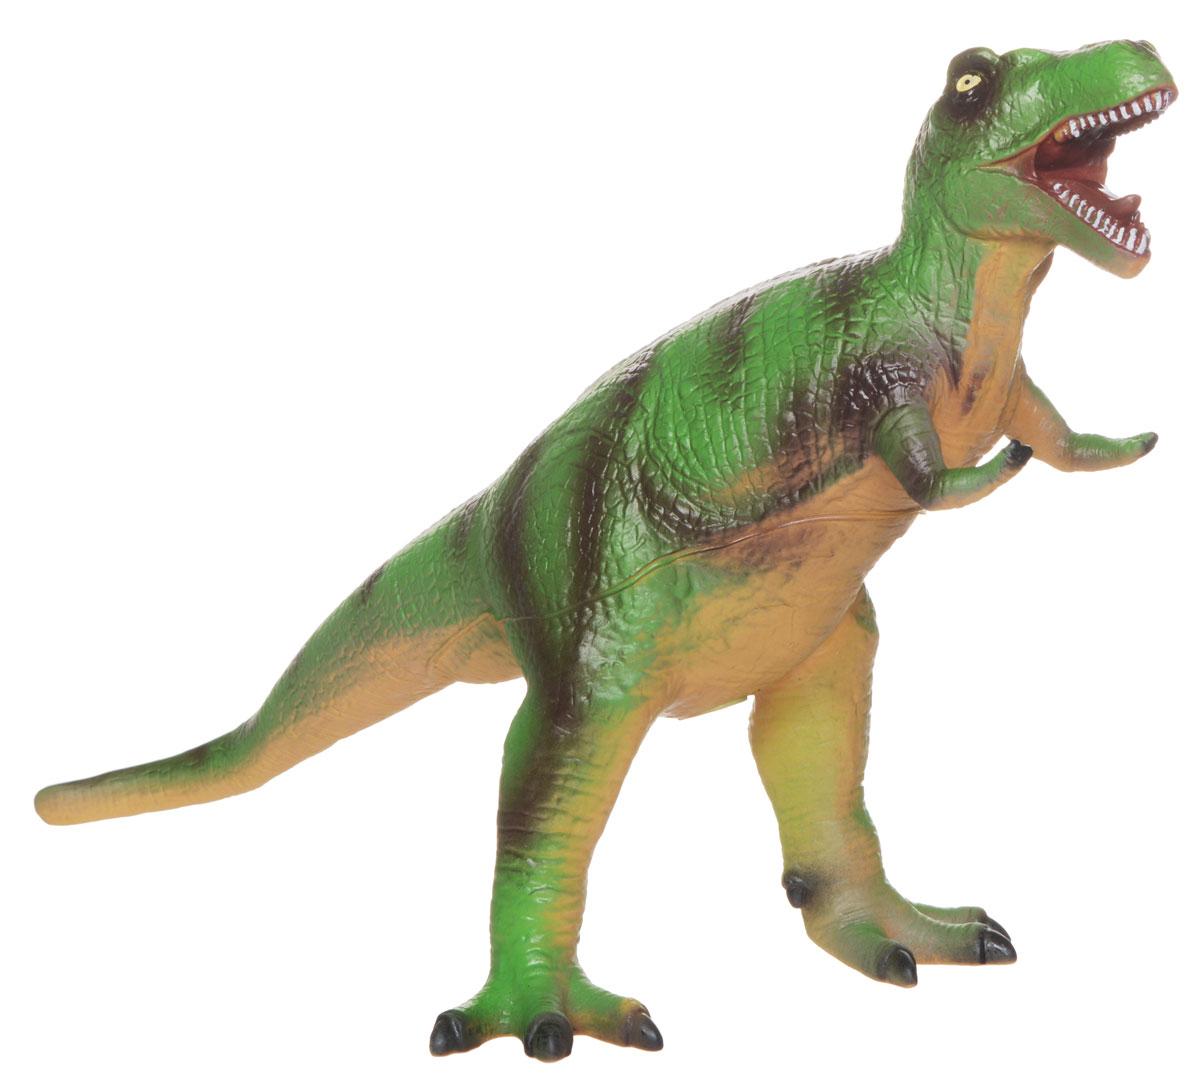 HGL Фигурка Тиранозавр hgl фигурка черепаха с подсветкой цвет ярко оранжевый